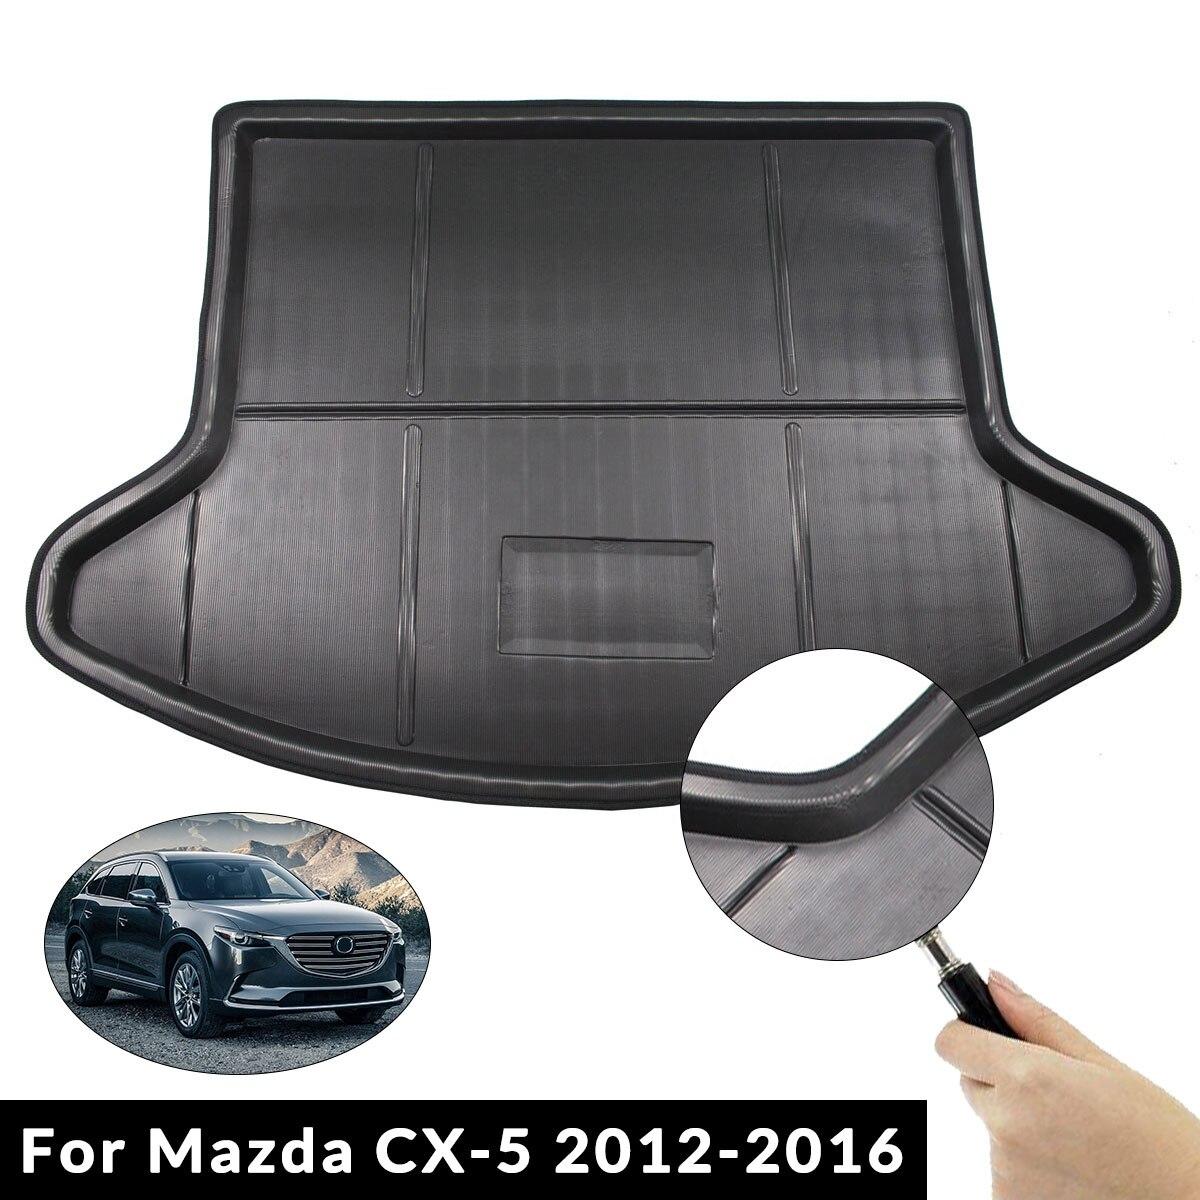 Car Interior Cargo Liner Boot Tray Rear Trunk Cover Matt Mat Floor Carpet Kick Pad For Mazda CX-5 CX5 2012 2013 2014 2015 2016